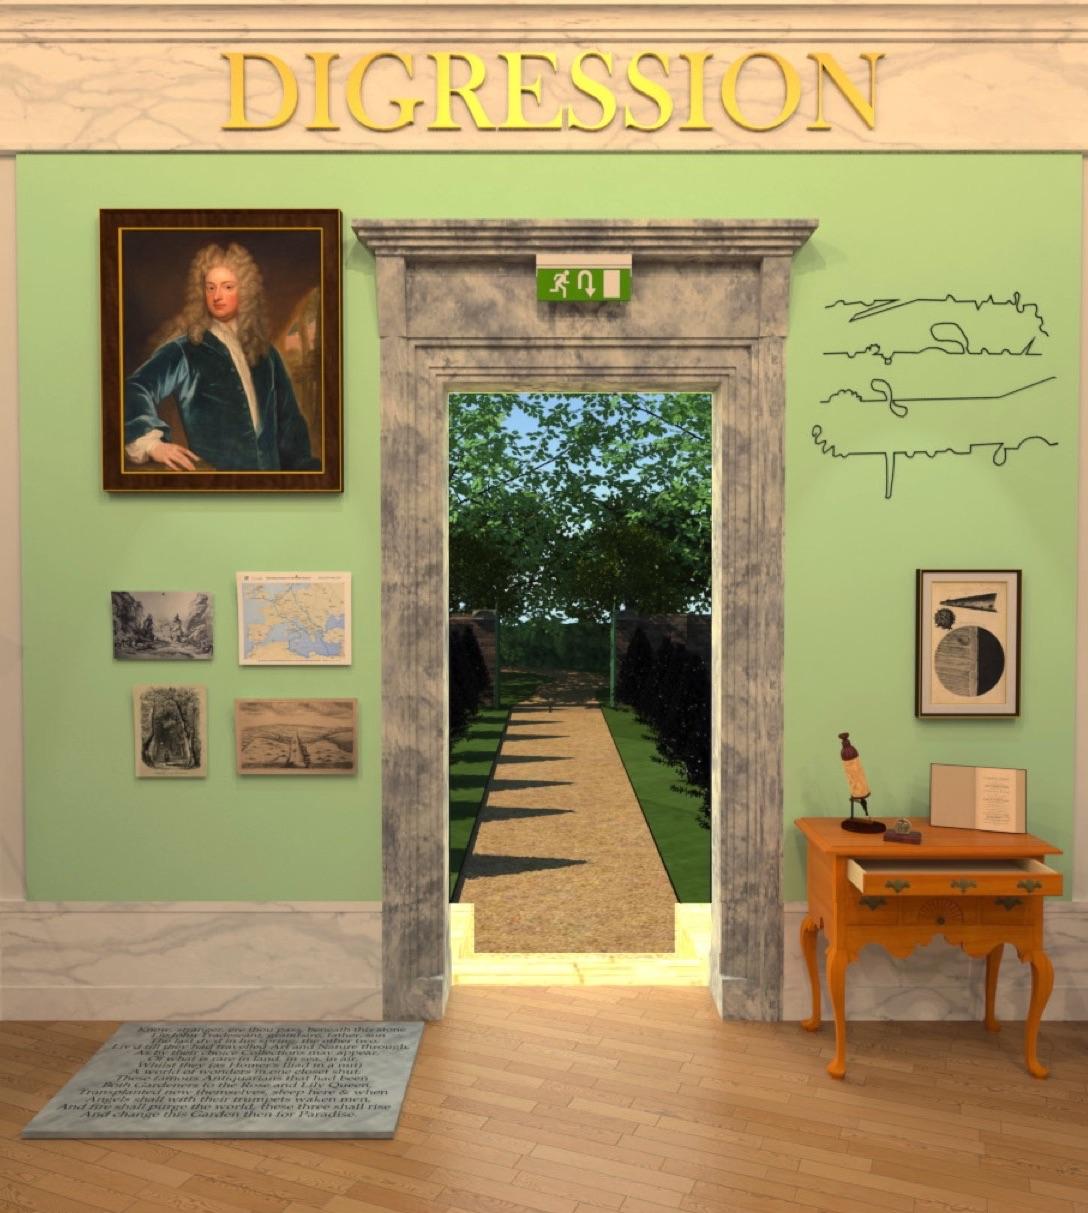 Digression.jpg